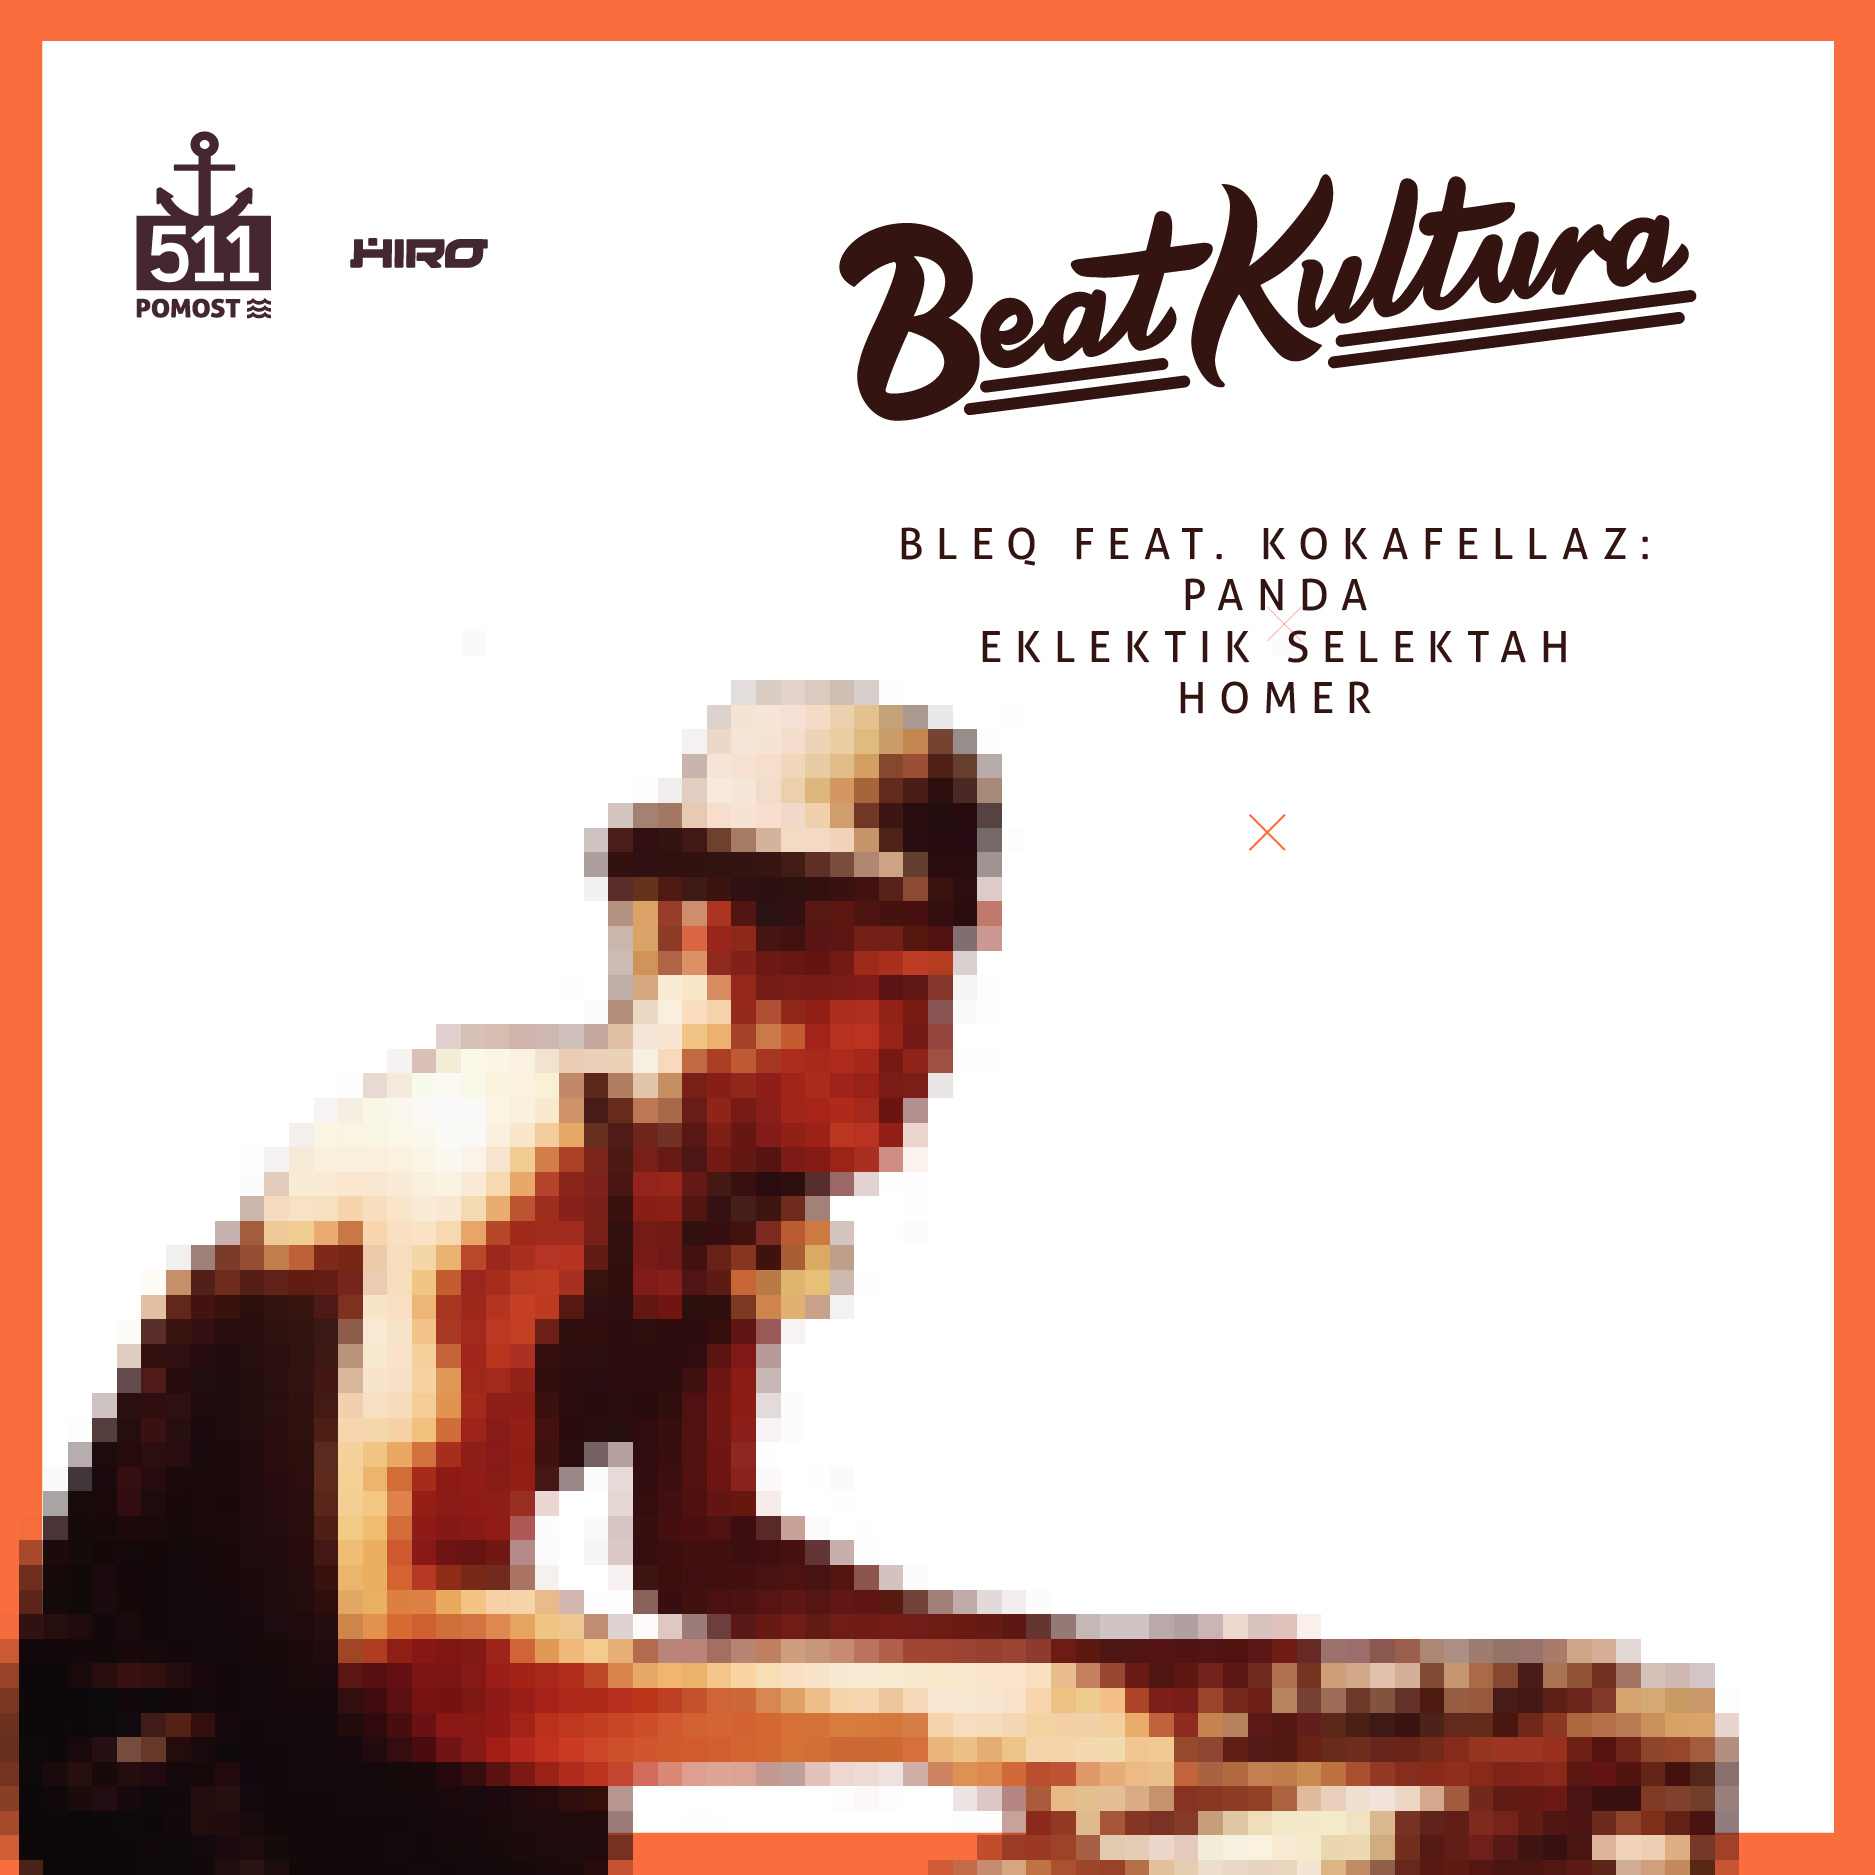 BeatKultura_Pomost511_14.08_Insta